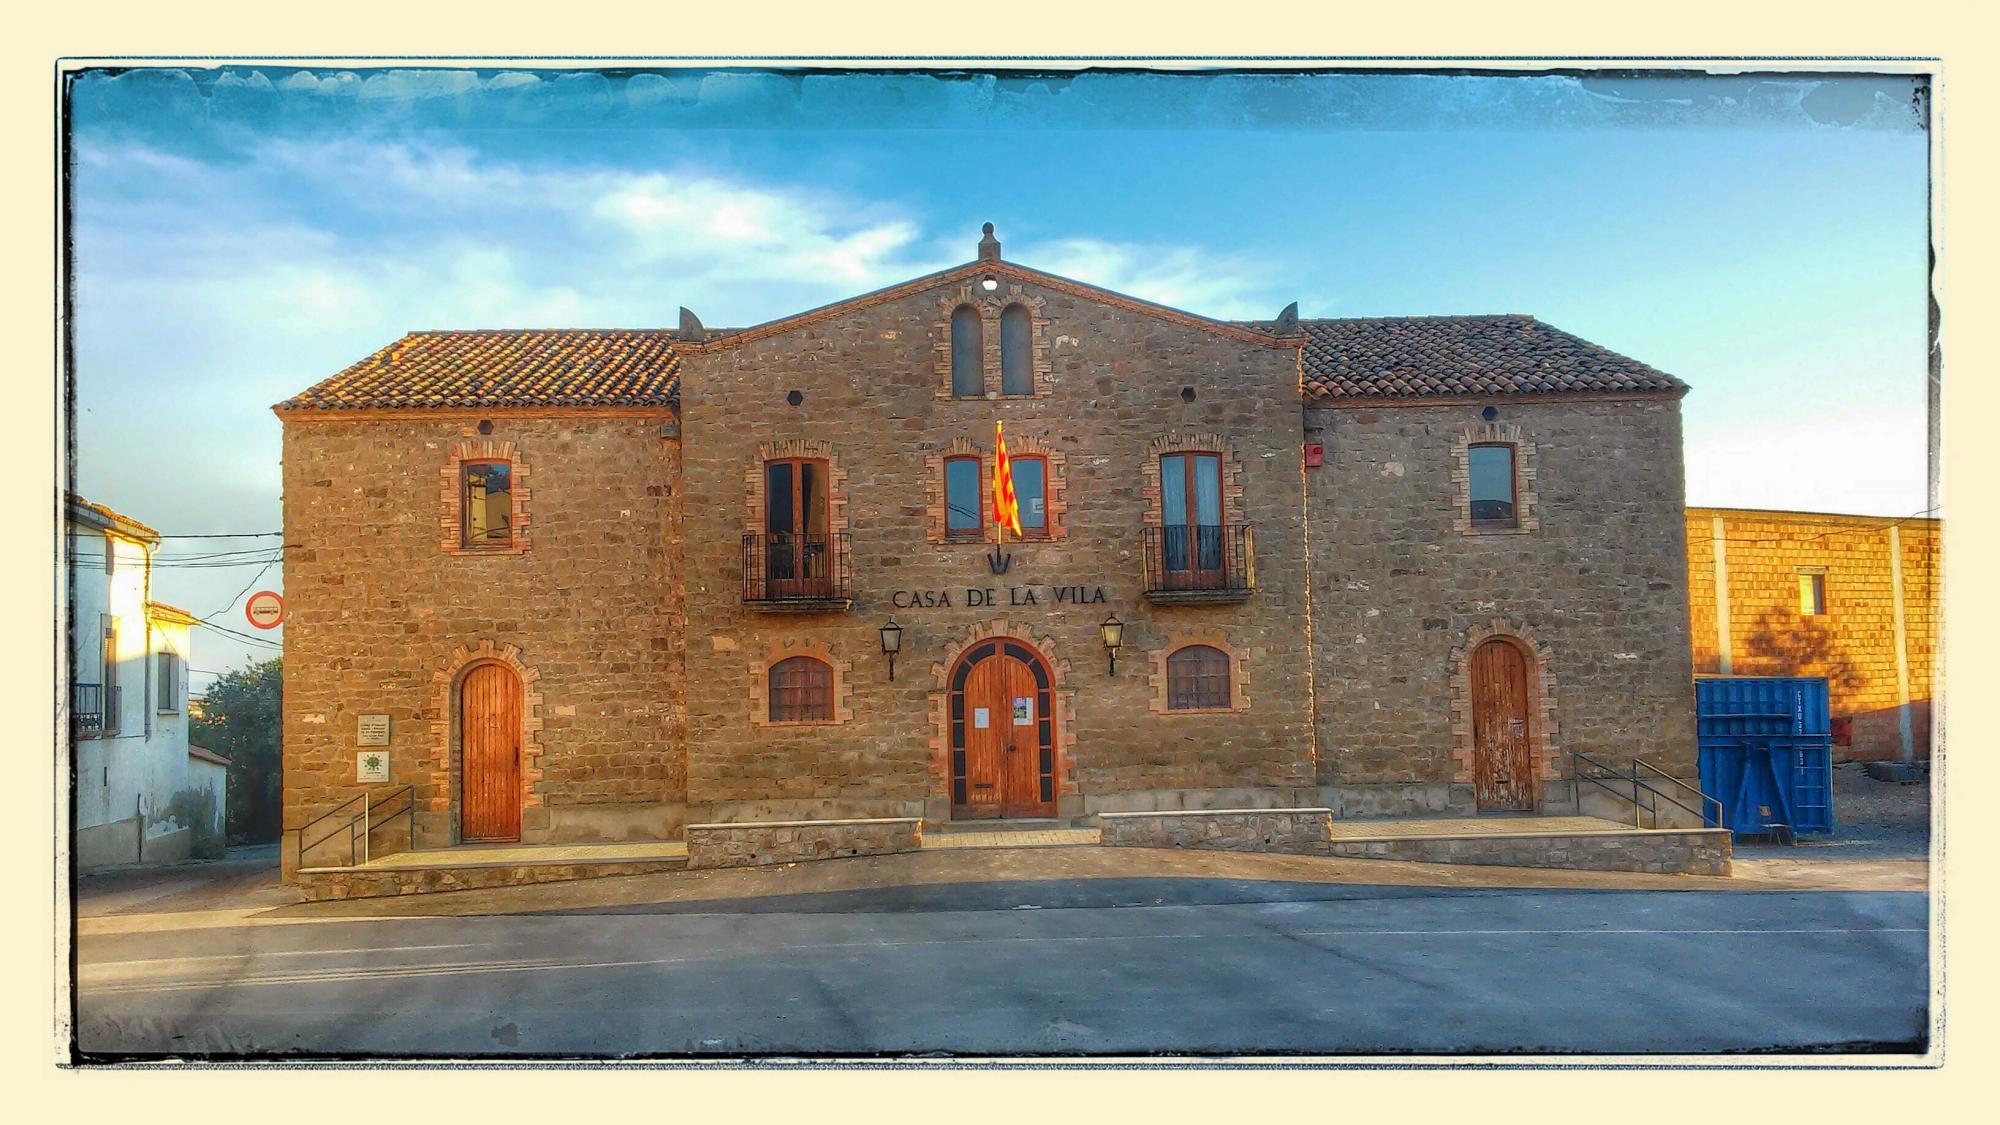 Edificio Ajuntament